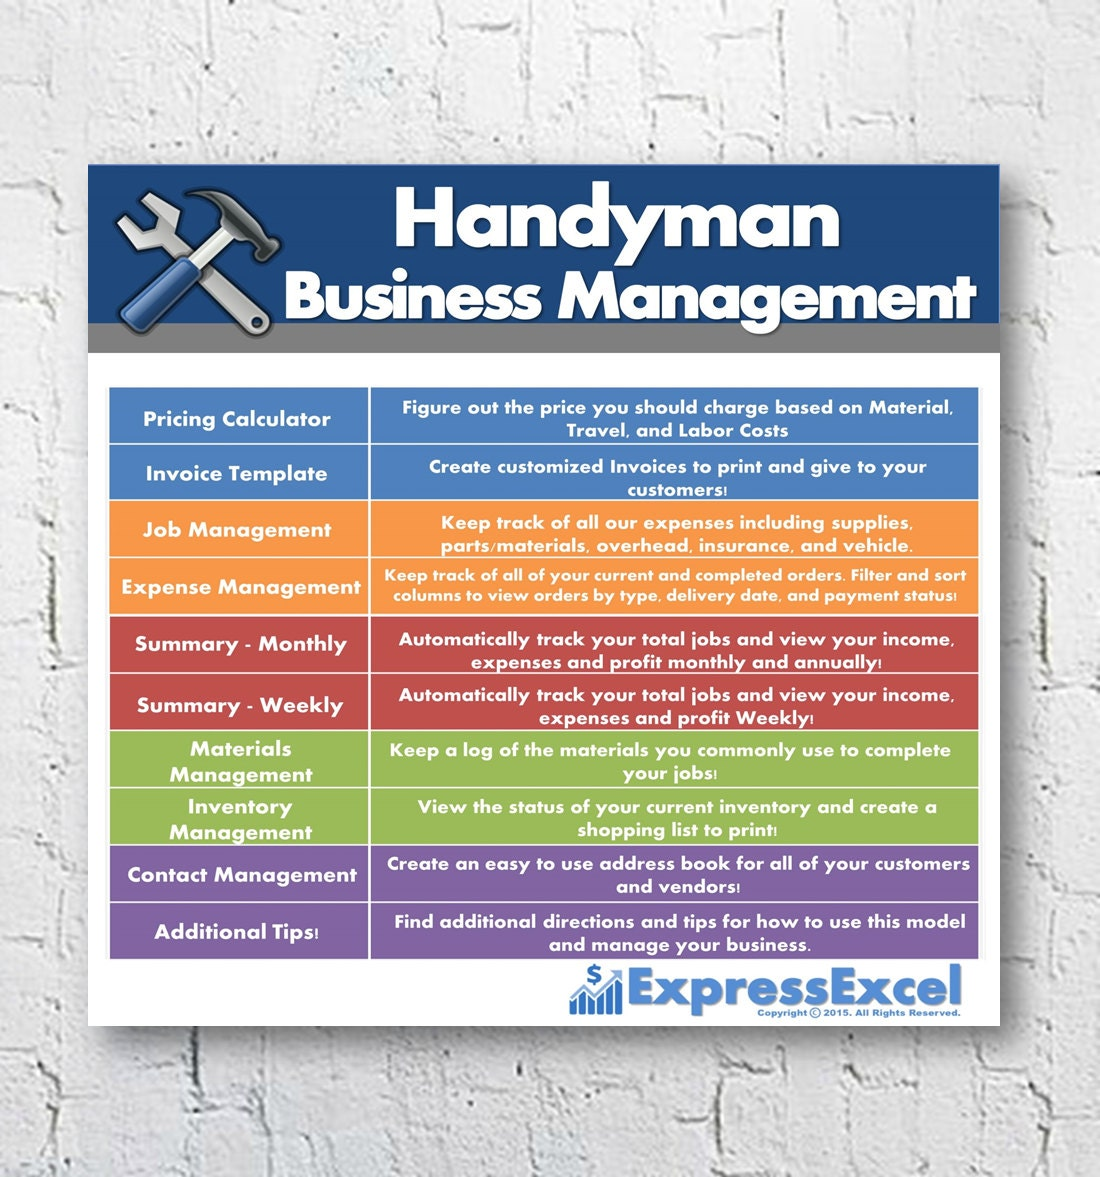 Free handyman price list -  Zoom